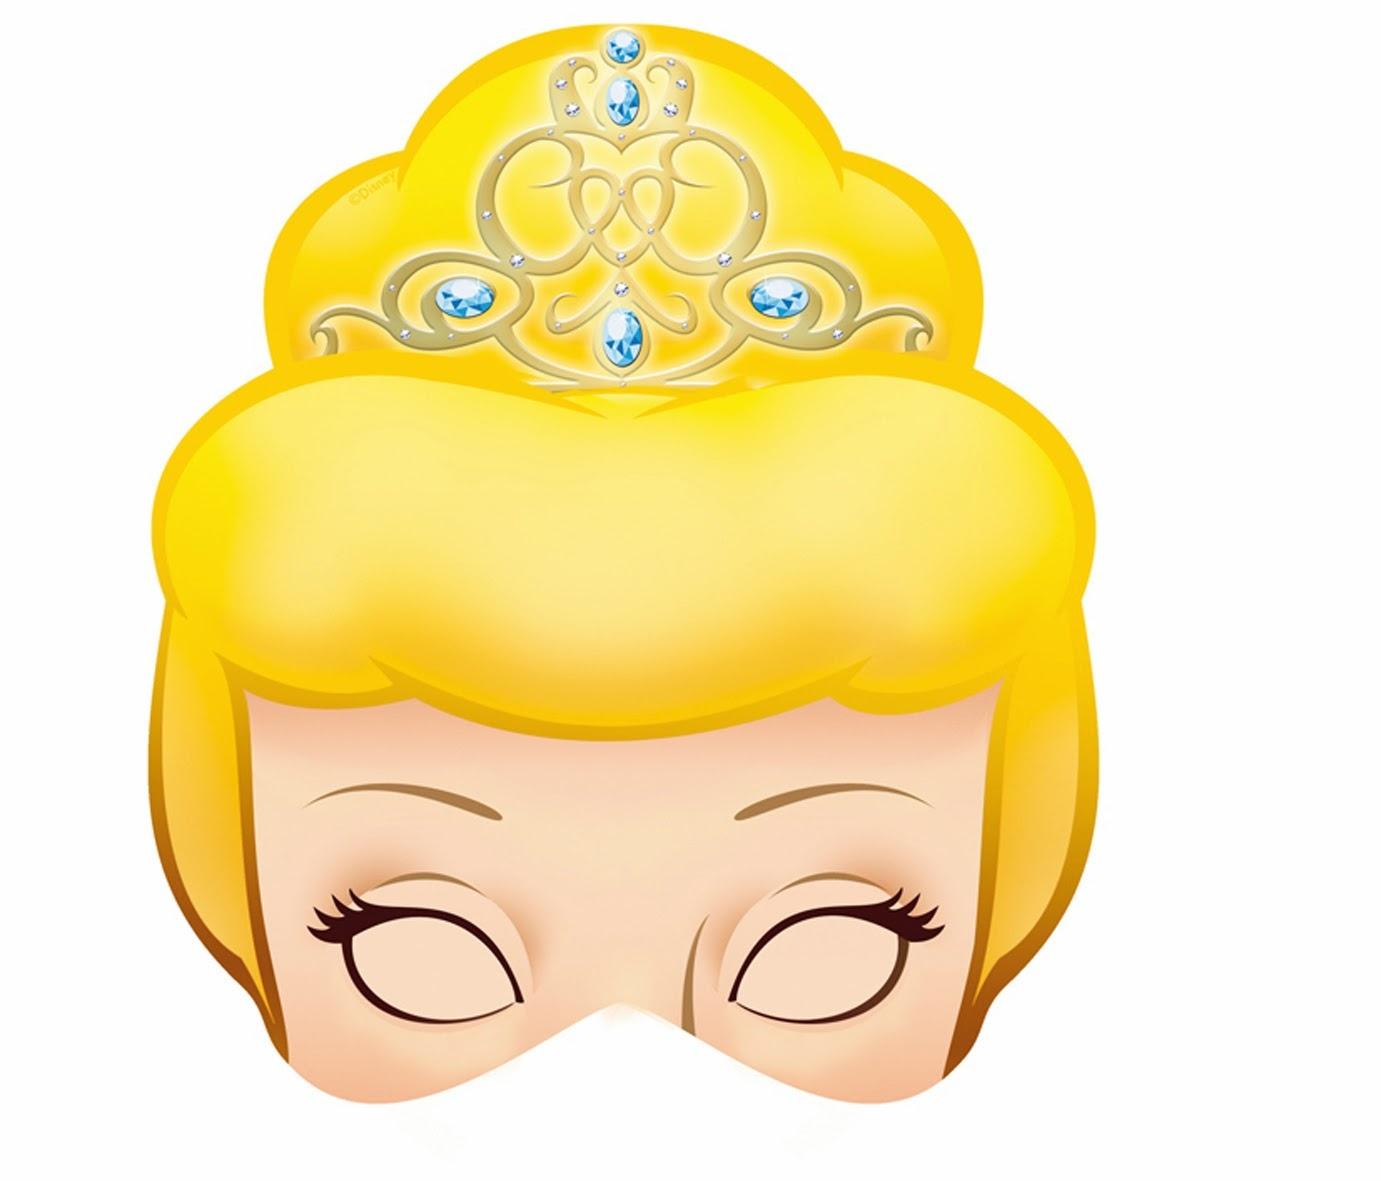 Cinderella Free Printable Masks. - Oh My Fiesta! In English - Free Printable Masks